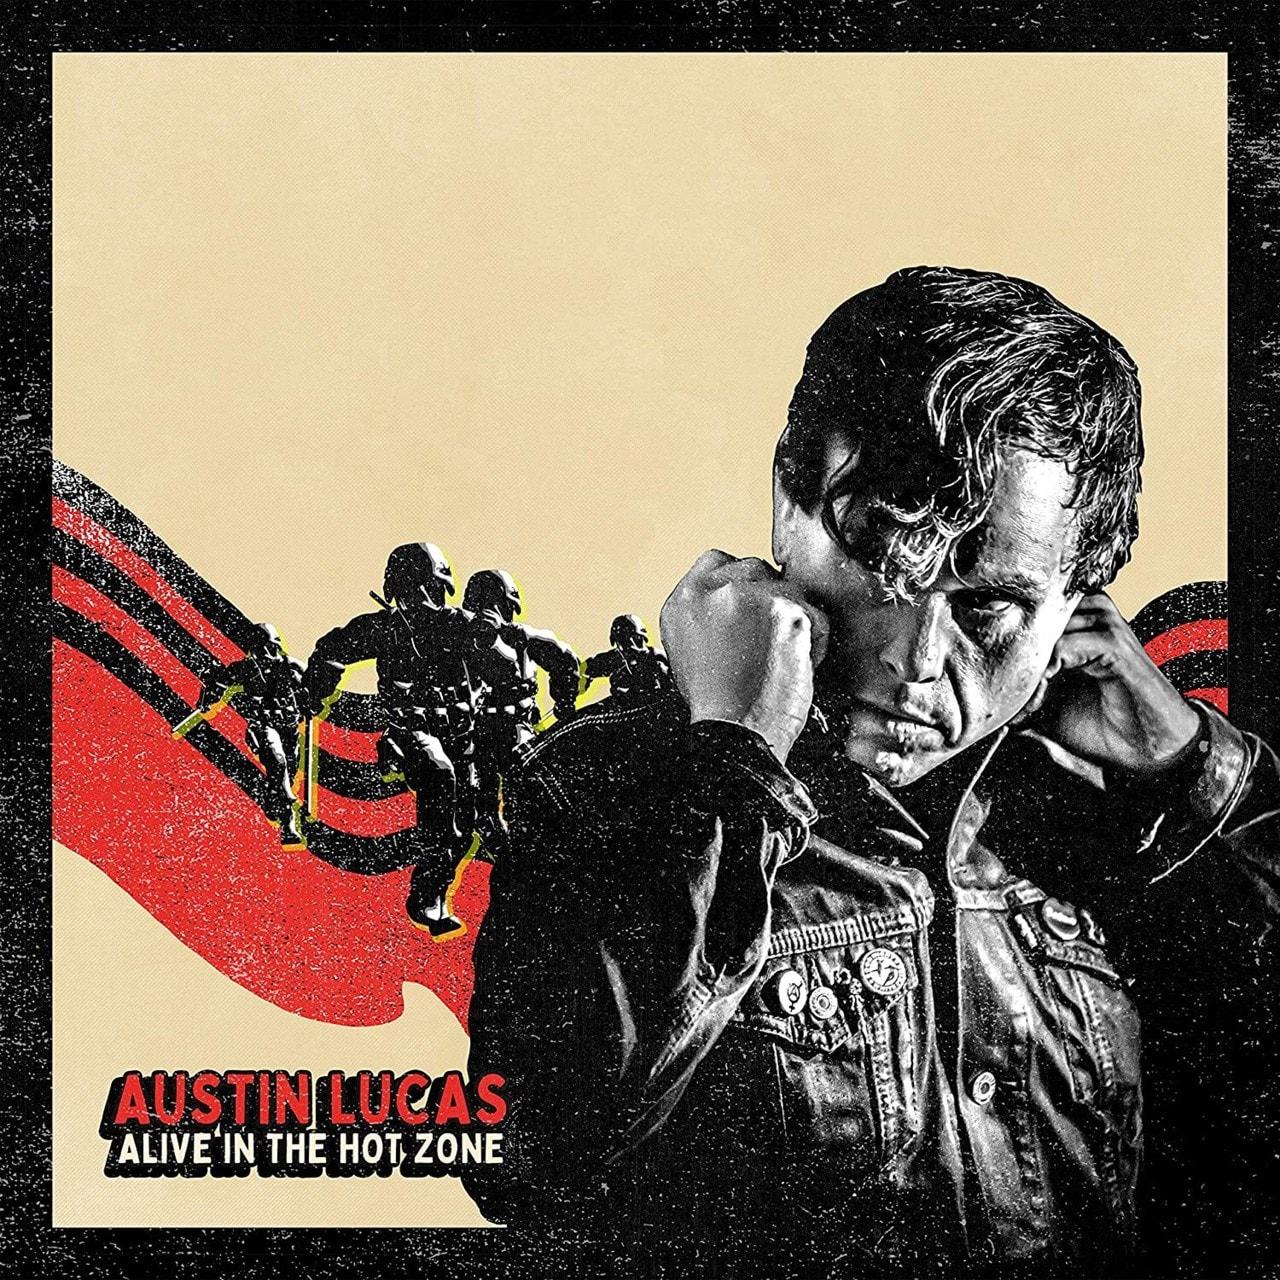 Alive in the Hot Zone - 1